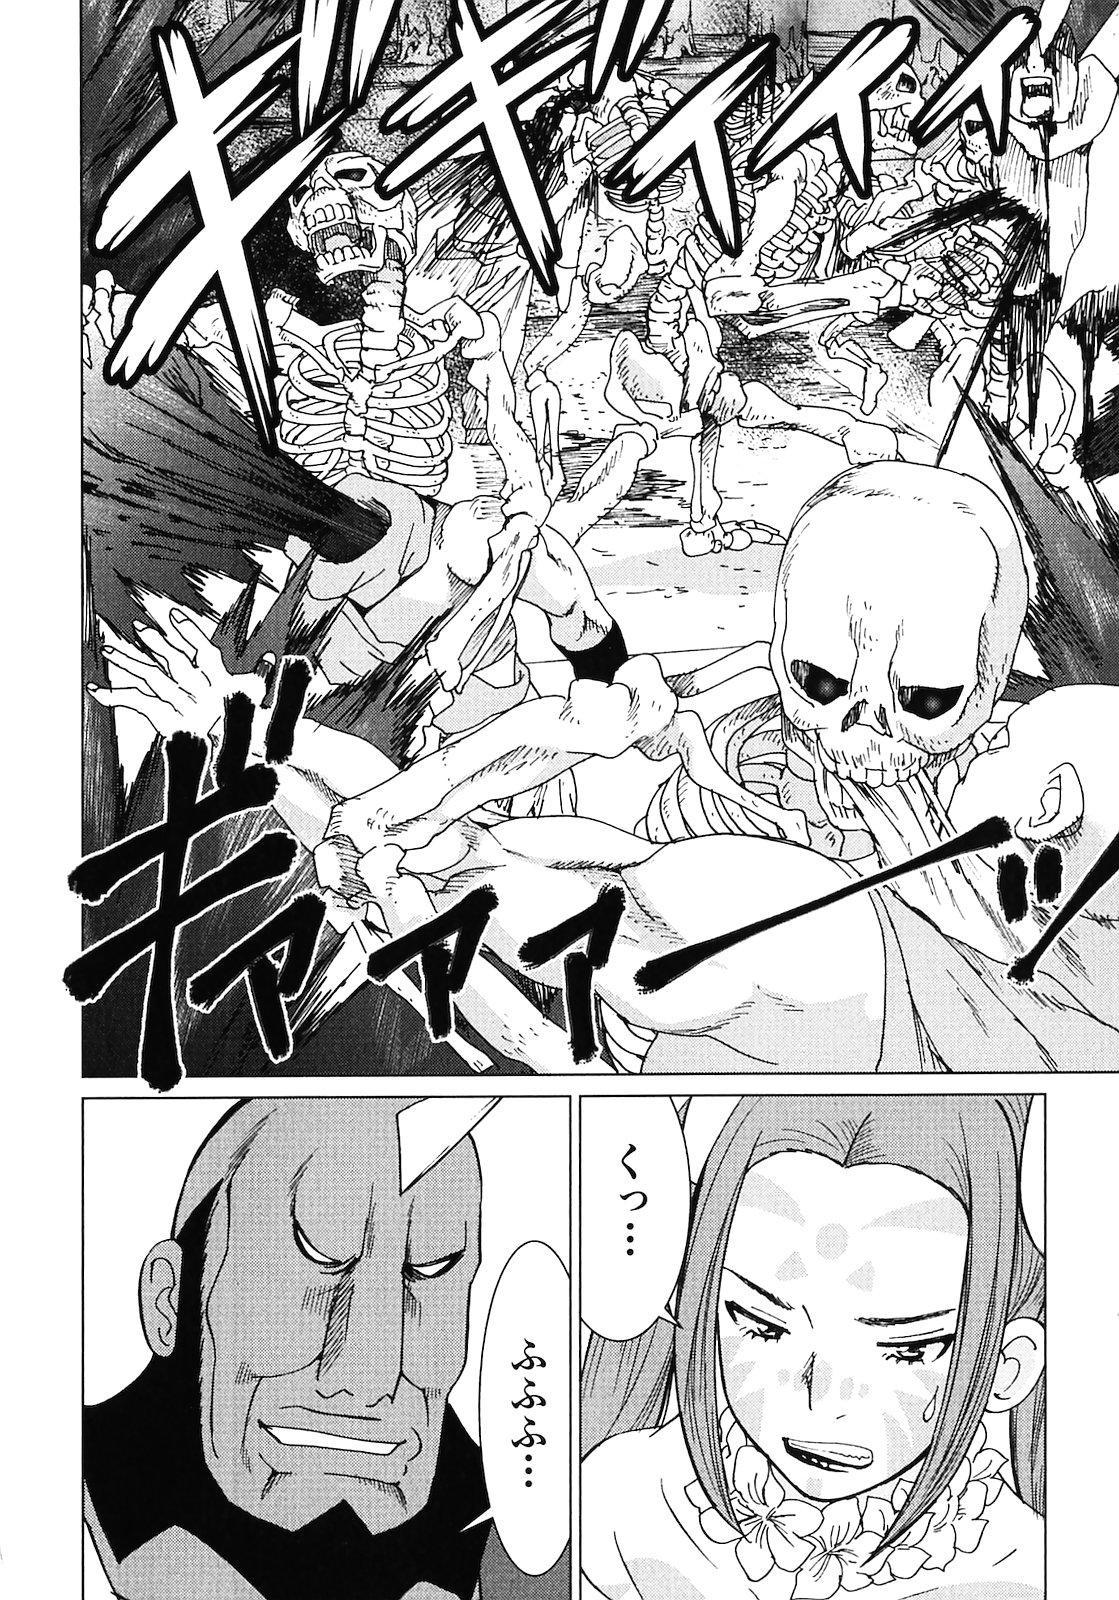 Makyo no Shanana Vol.02 155